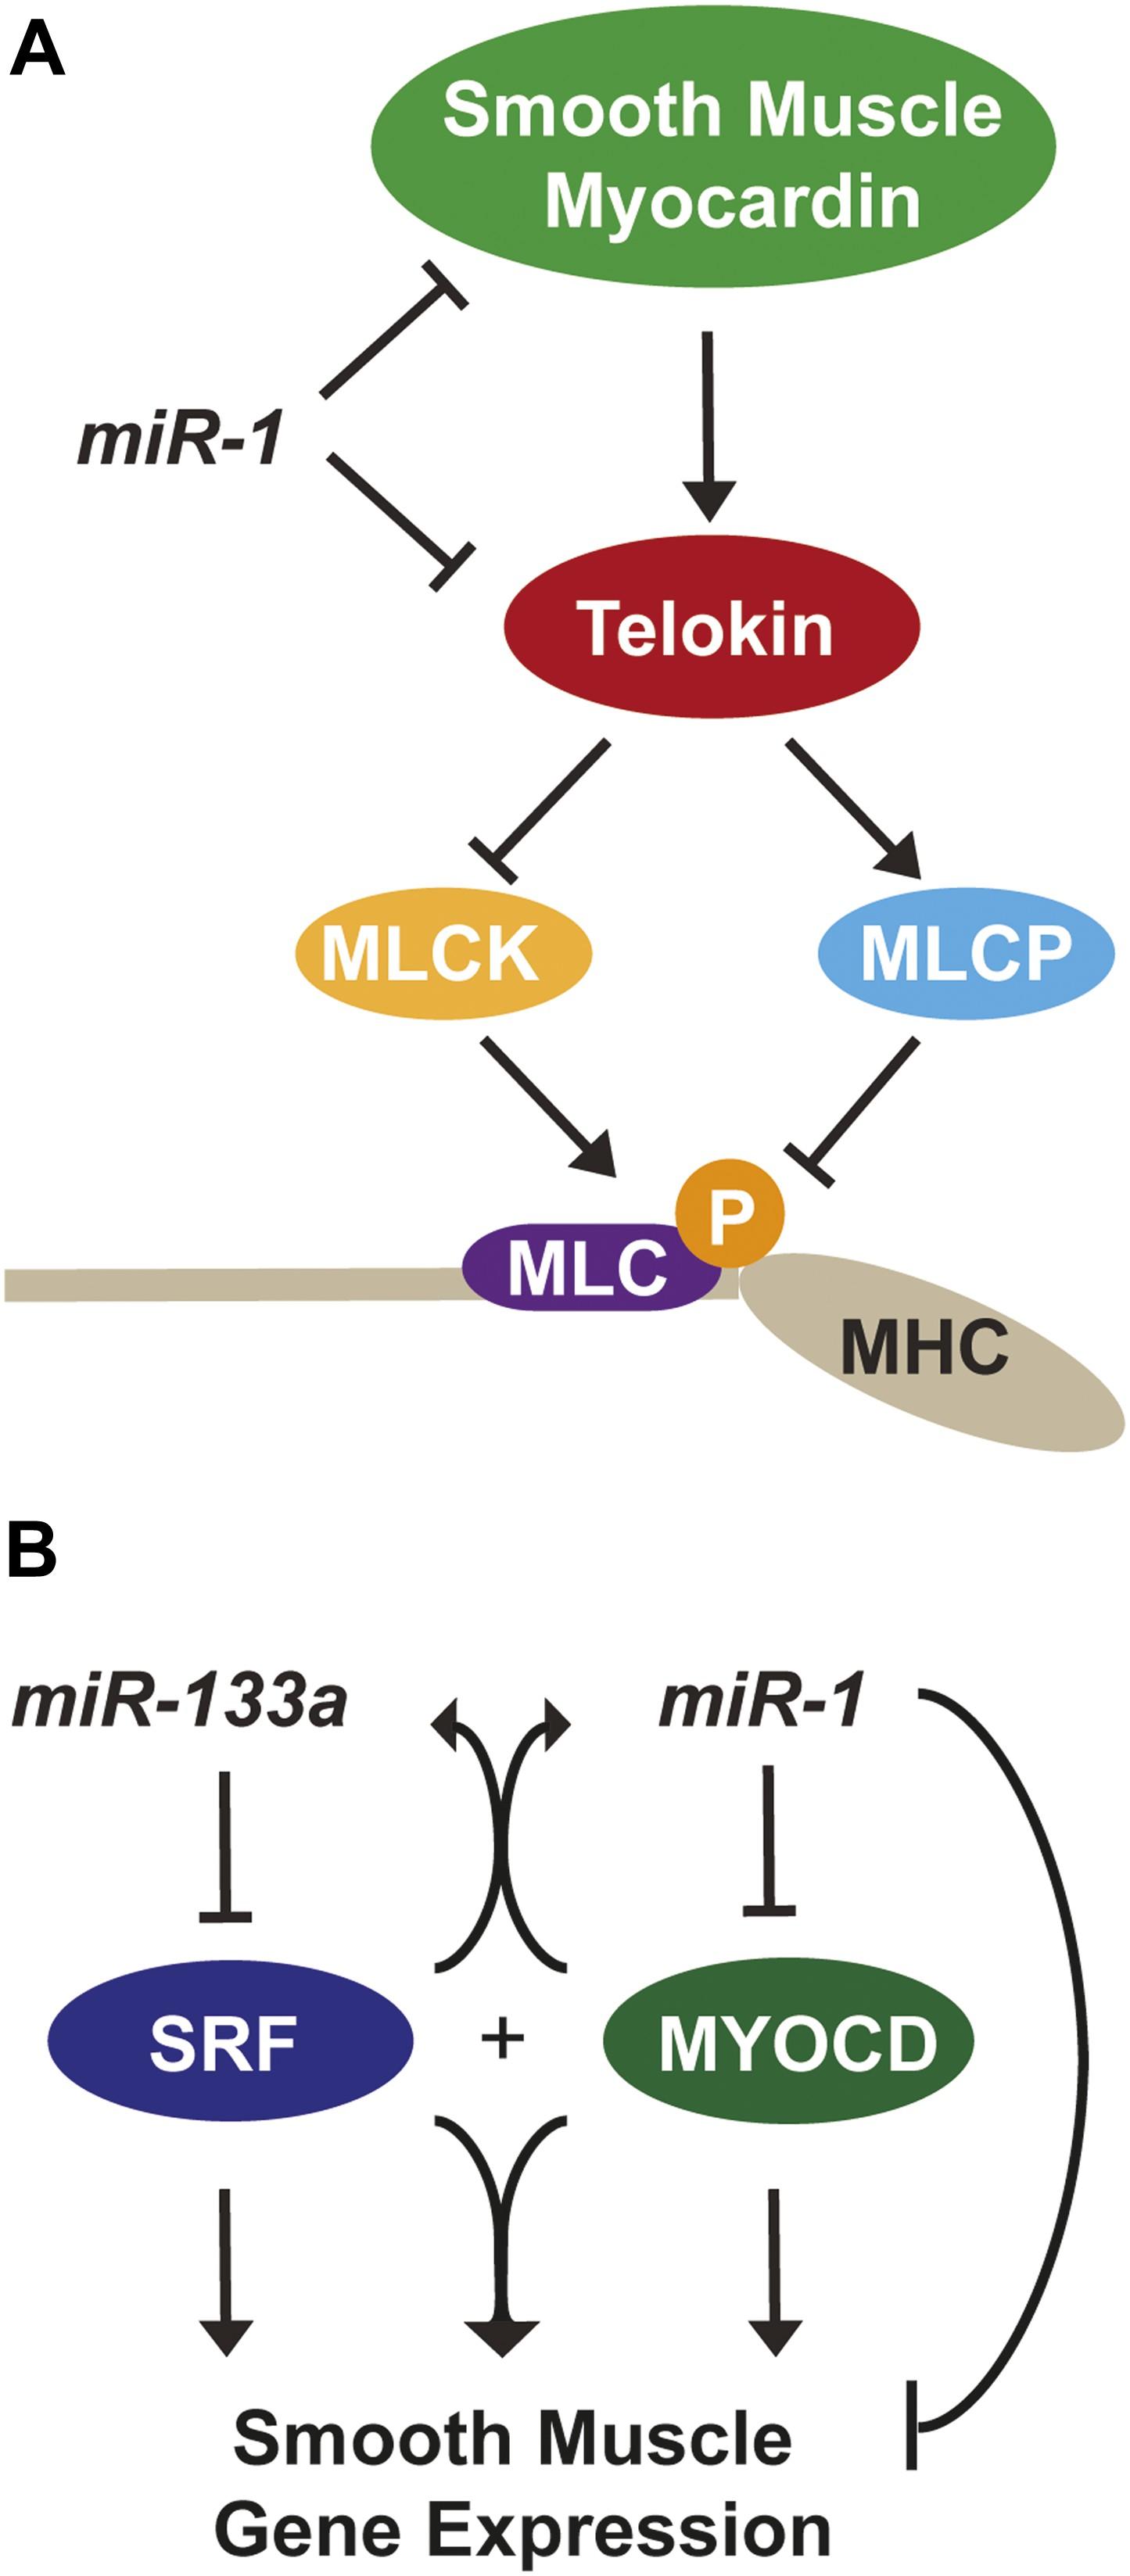 Microrna 1 regulates sarcomere formation and suppresses smooth download asset open asset altavistaventures Images